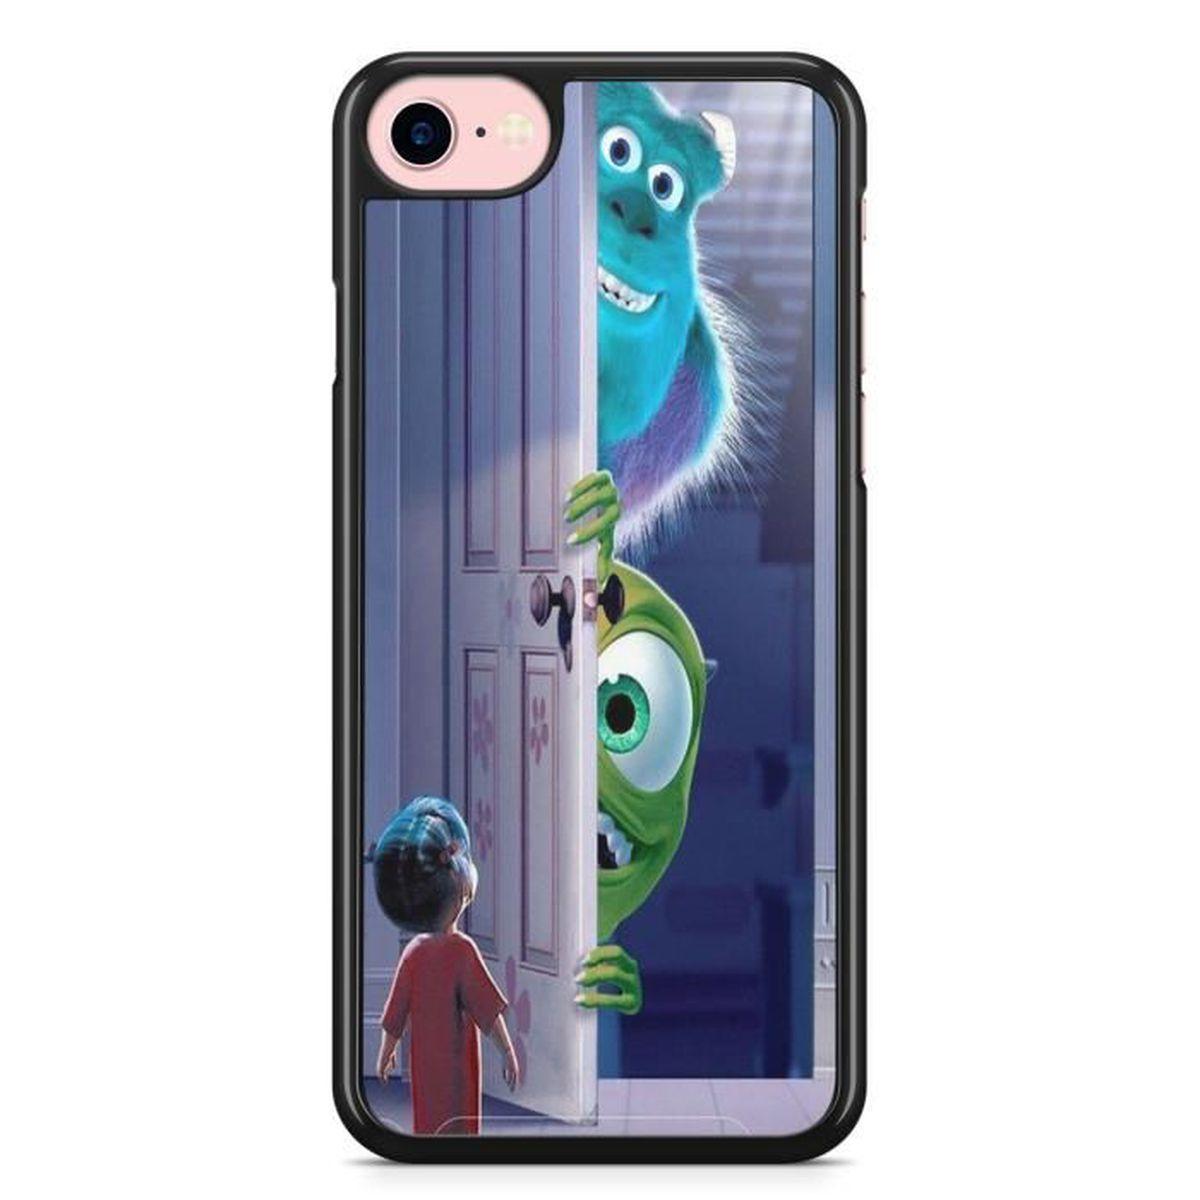 Coque Iphone 6 plus 6S plus Monstre et Compagnie dessin animé etui ...